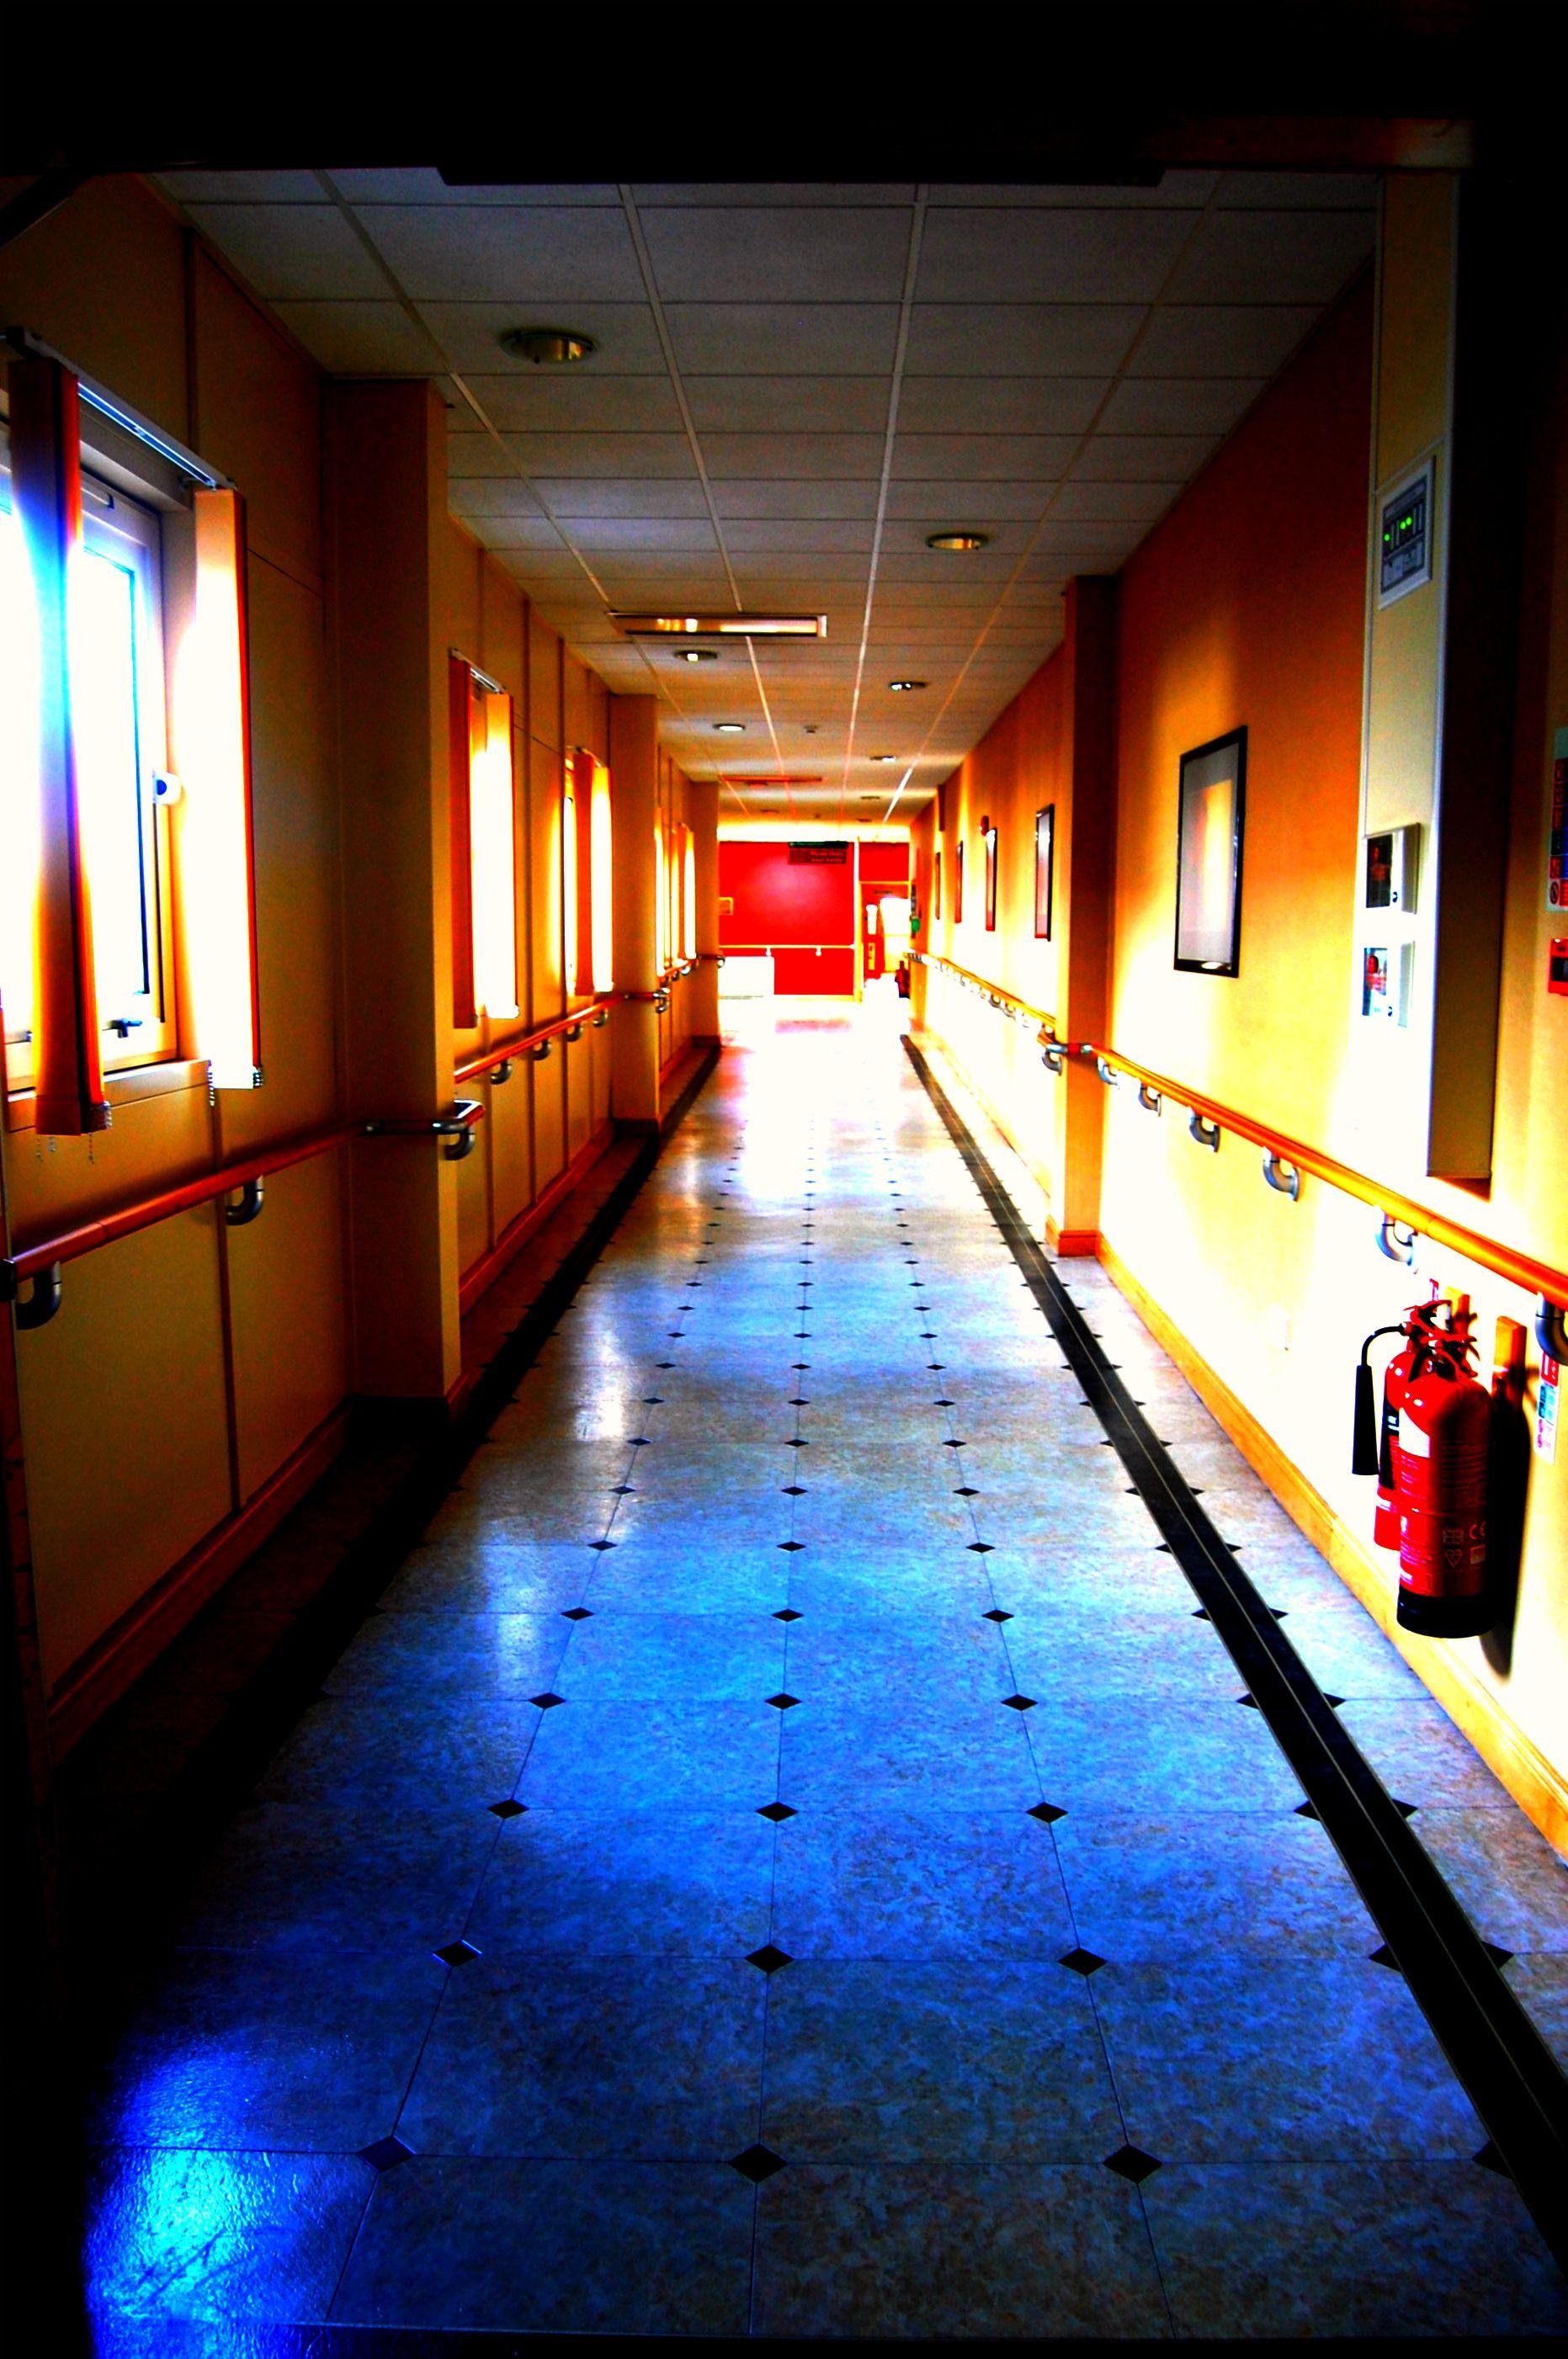 My Creation Of Catherine Yass Corridors Installations